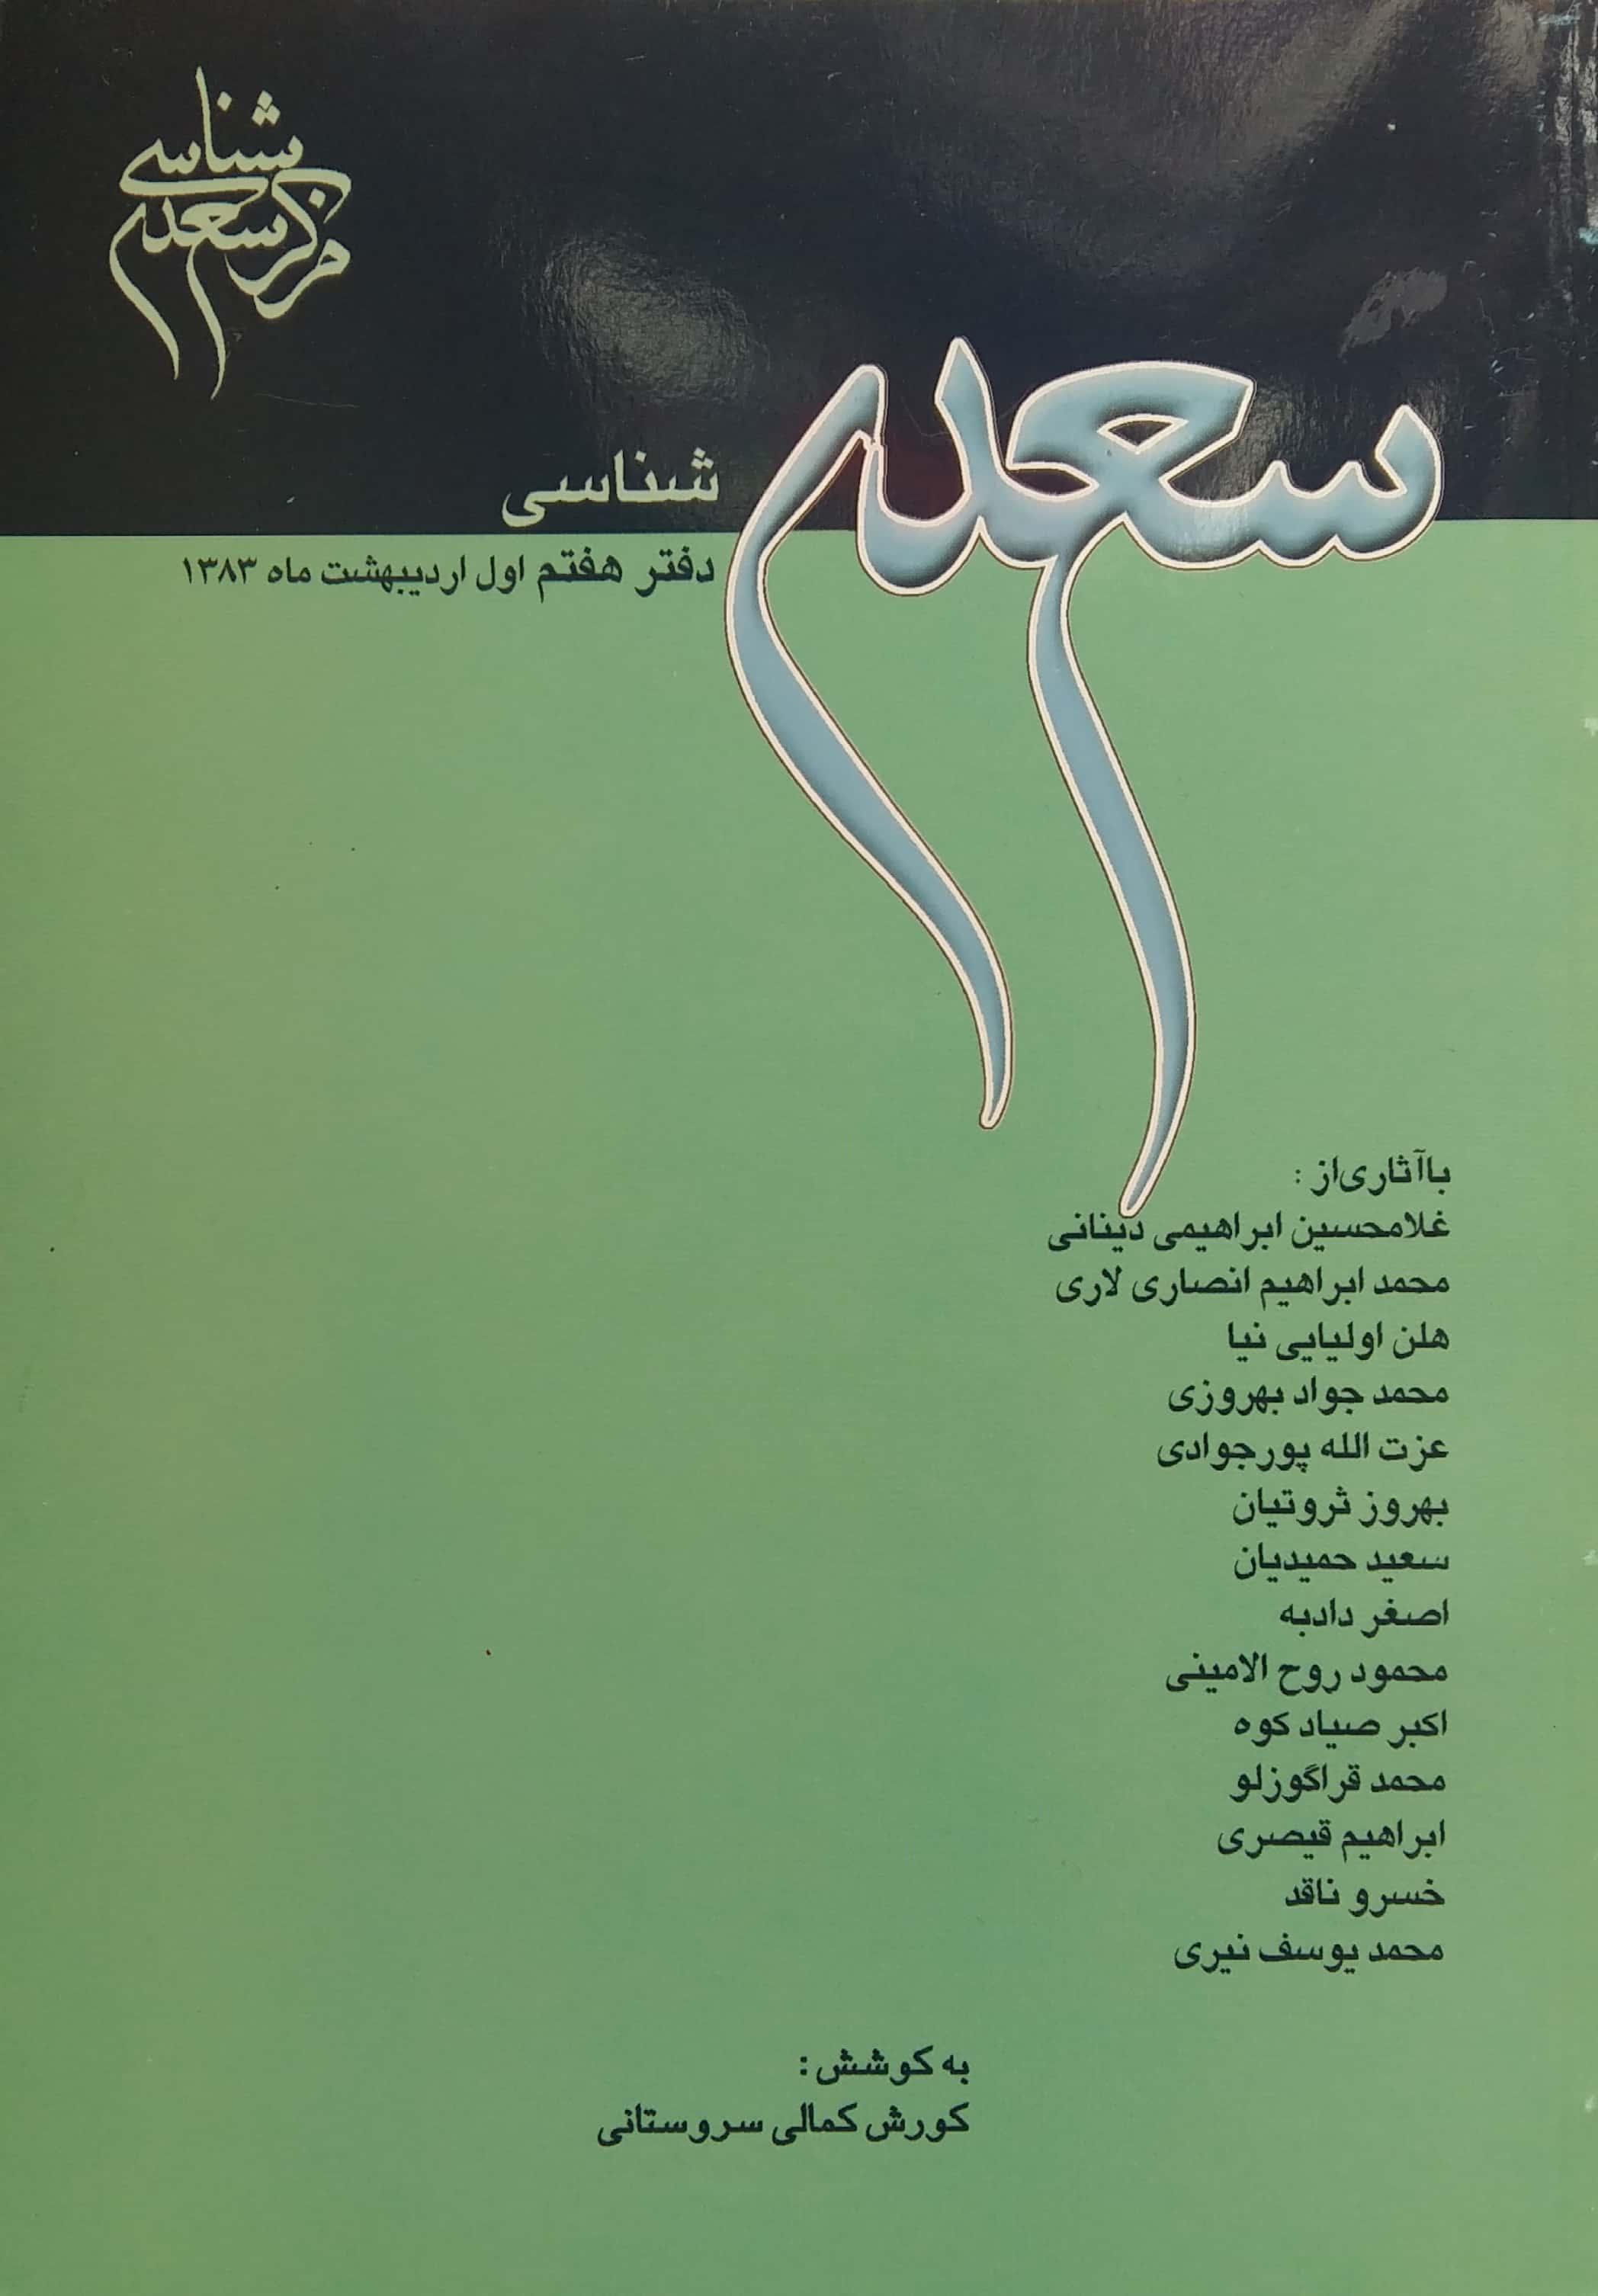 بنياد فارس شناسي سعدی شناسی دفتر هفتم (به کوشش کوروش کمالی سروستانی)